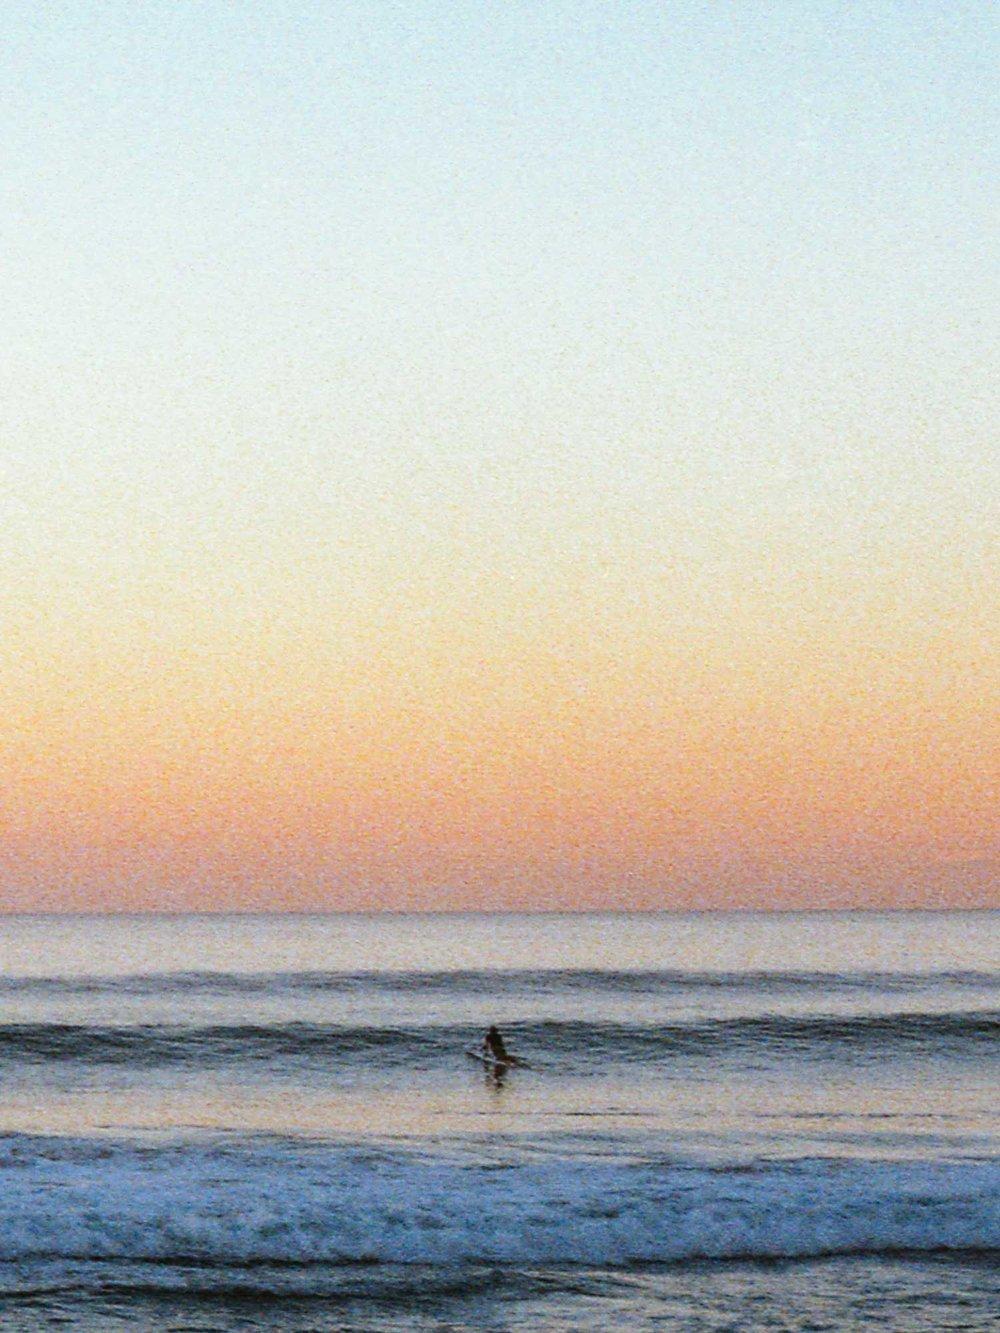 surfer-stretch-glassy-waves.jpg